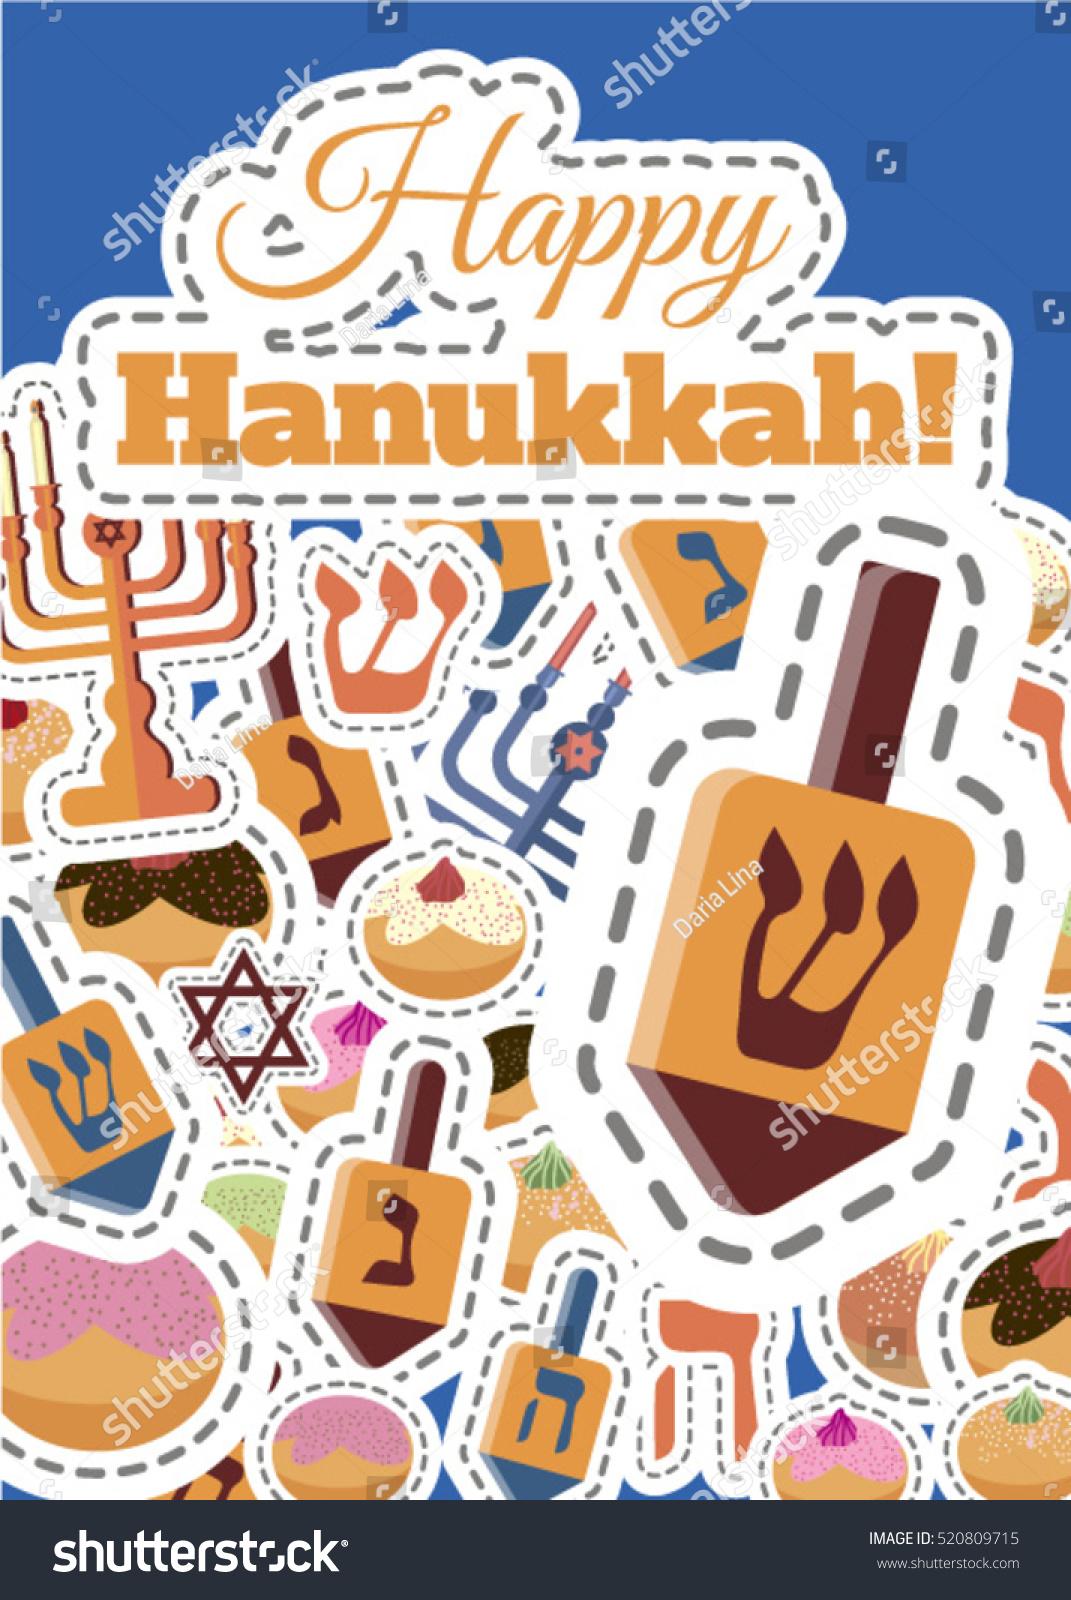 Happy Hanukkah Greeting Card Design Feast Stock Vector 520809715